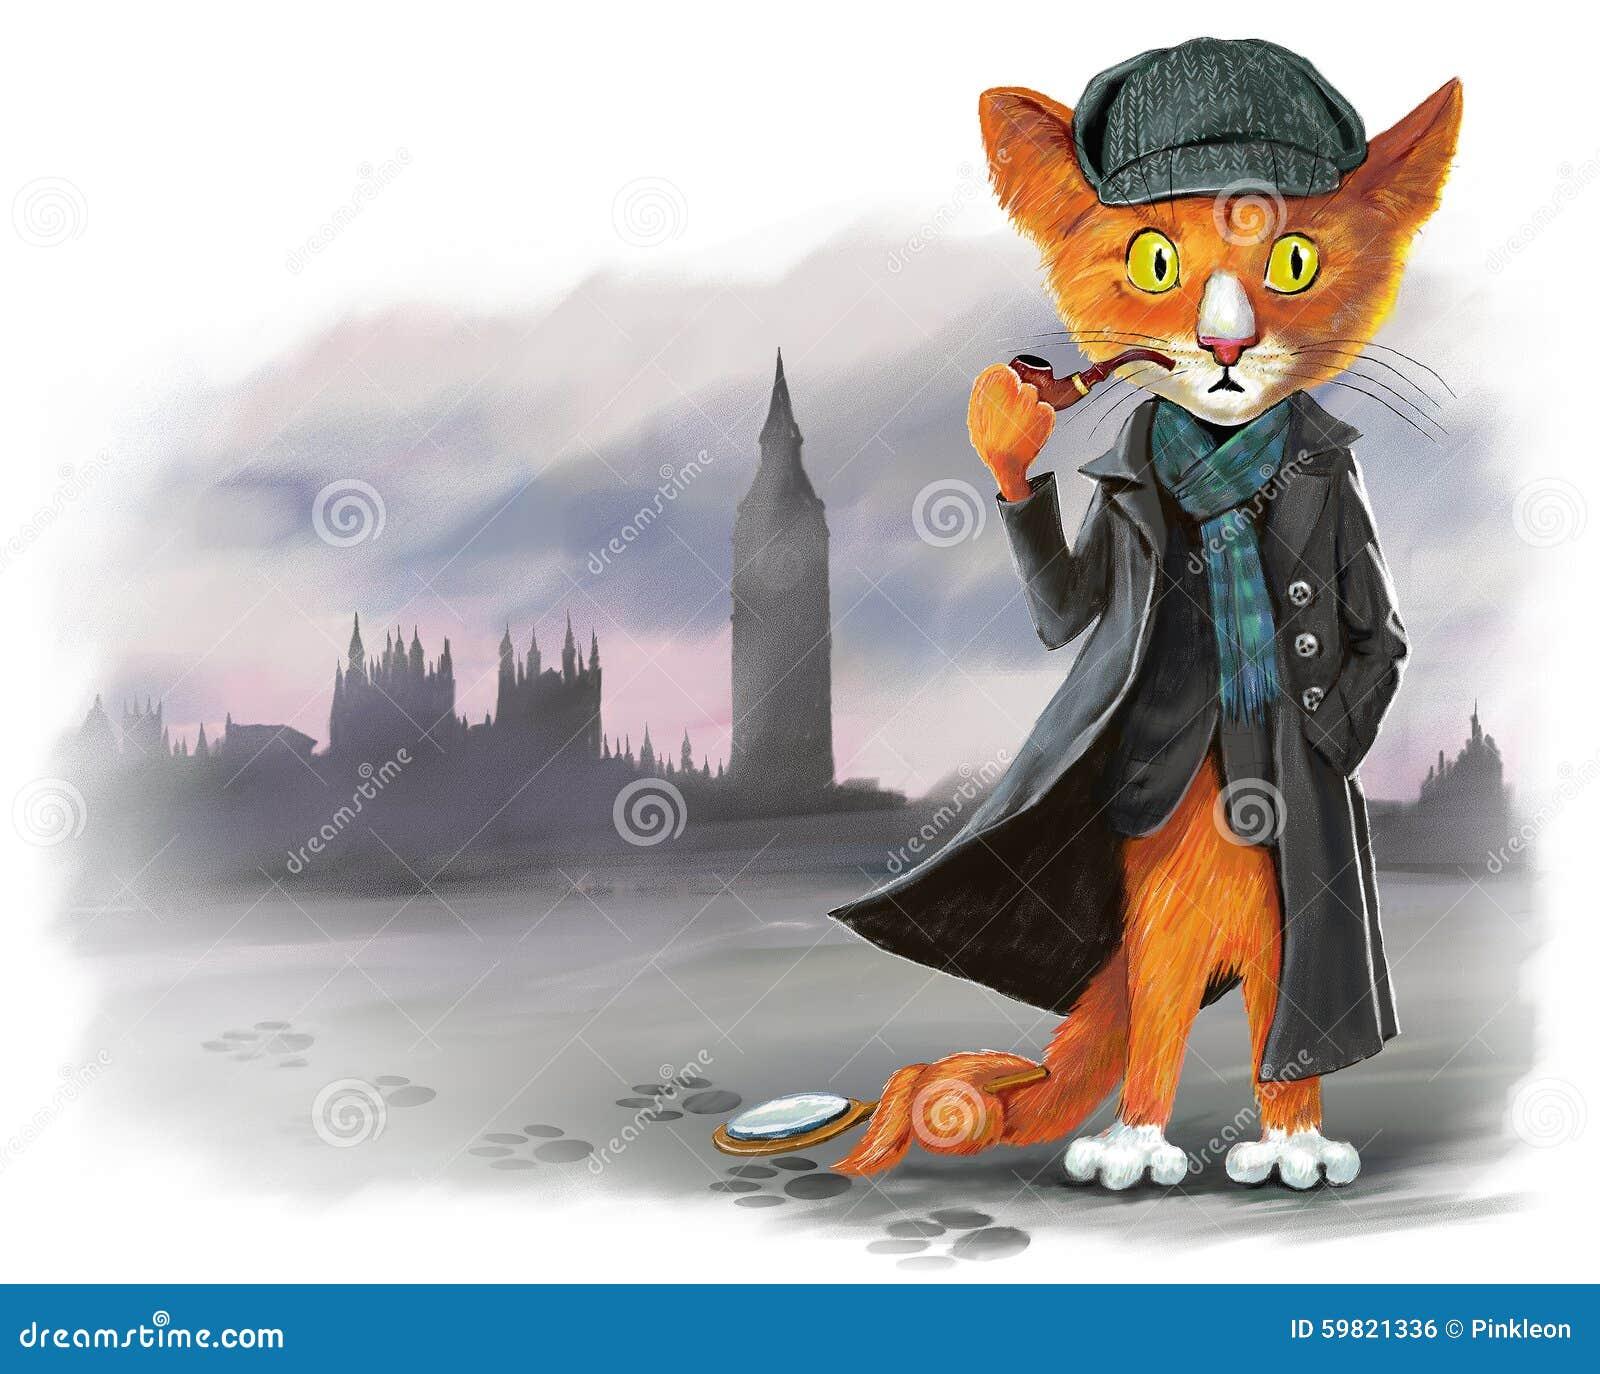 Celebrity detective sherlock kitty